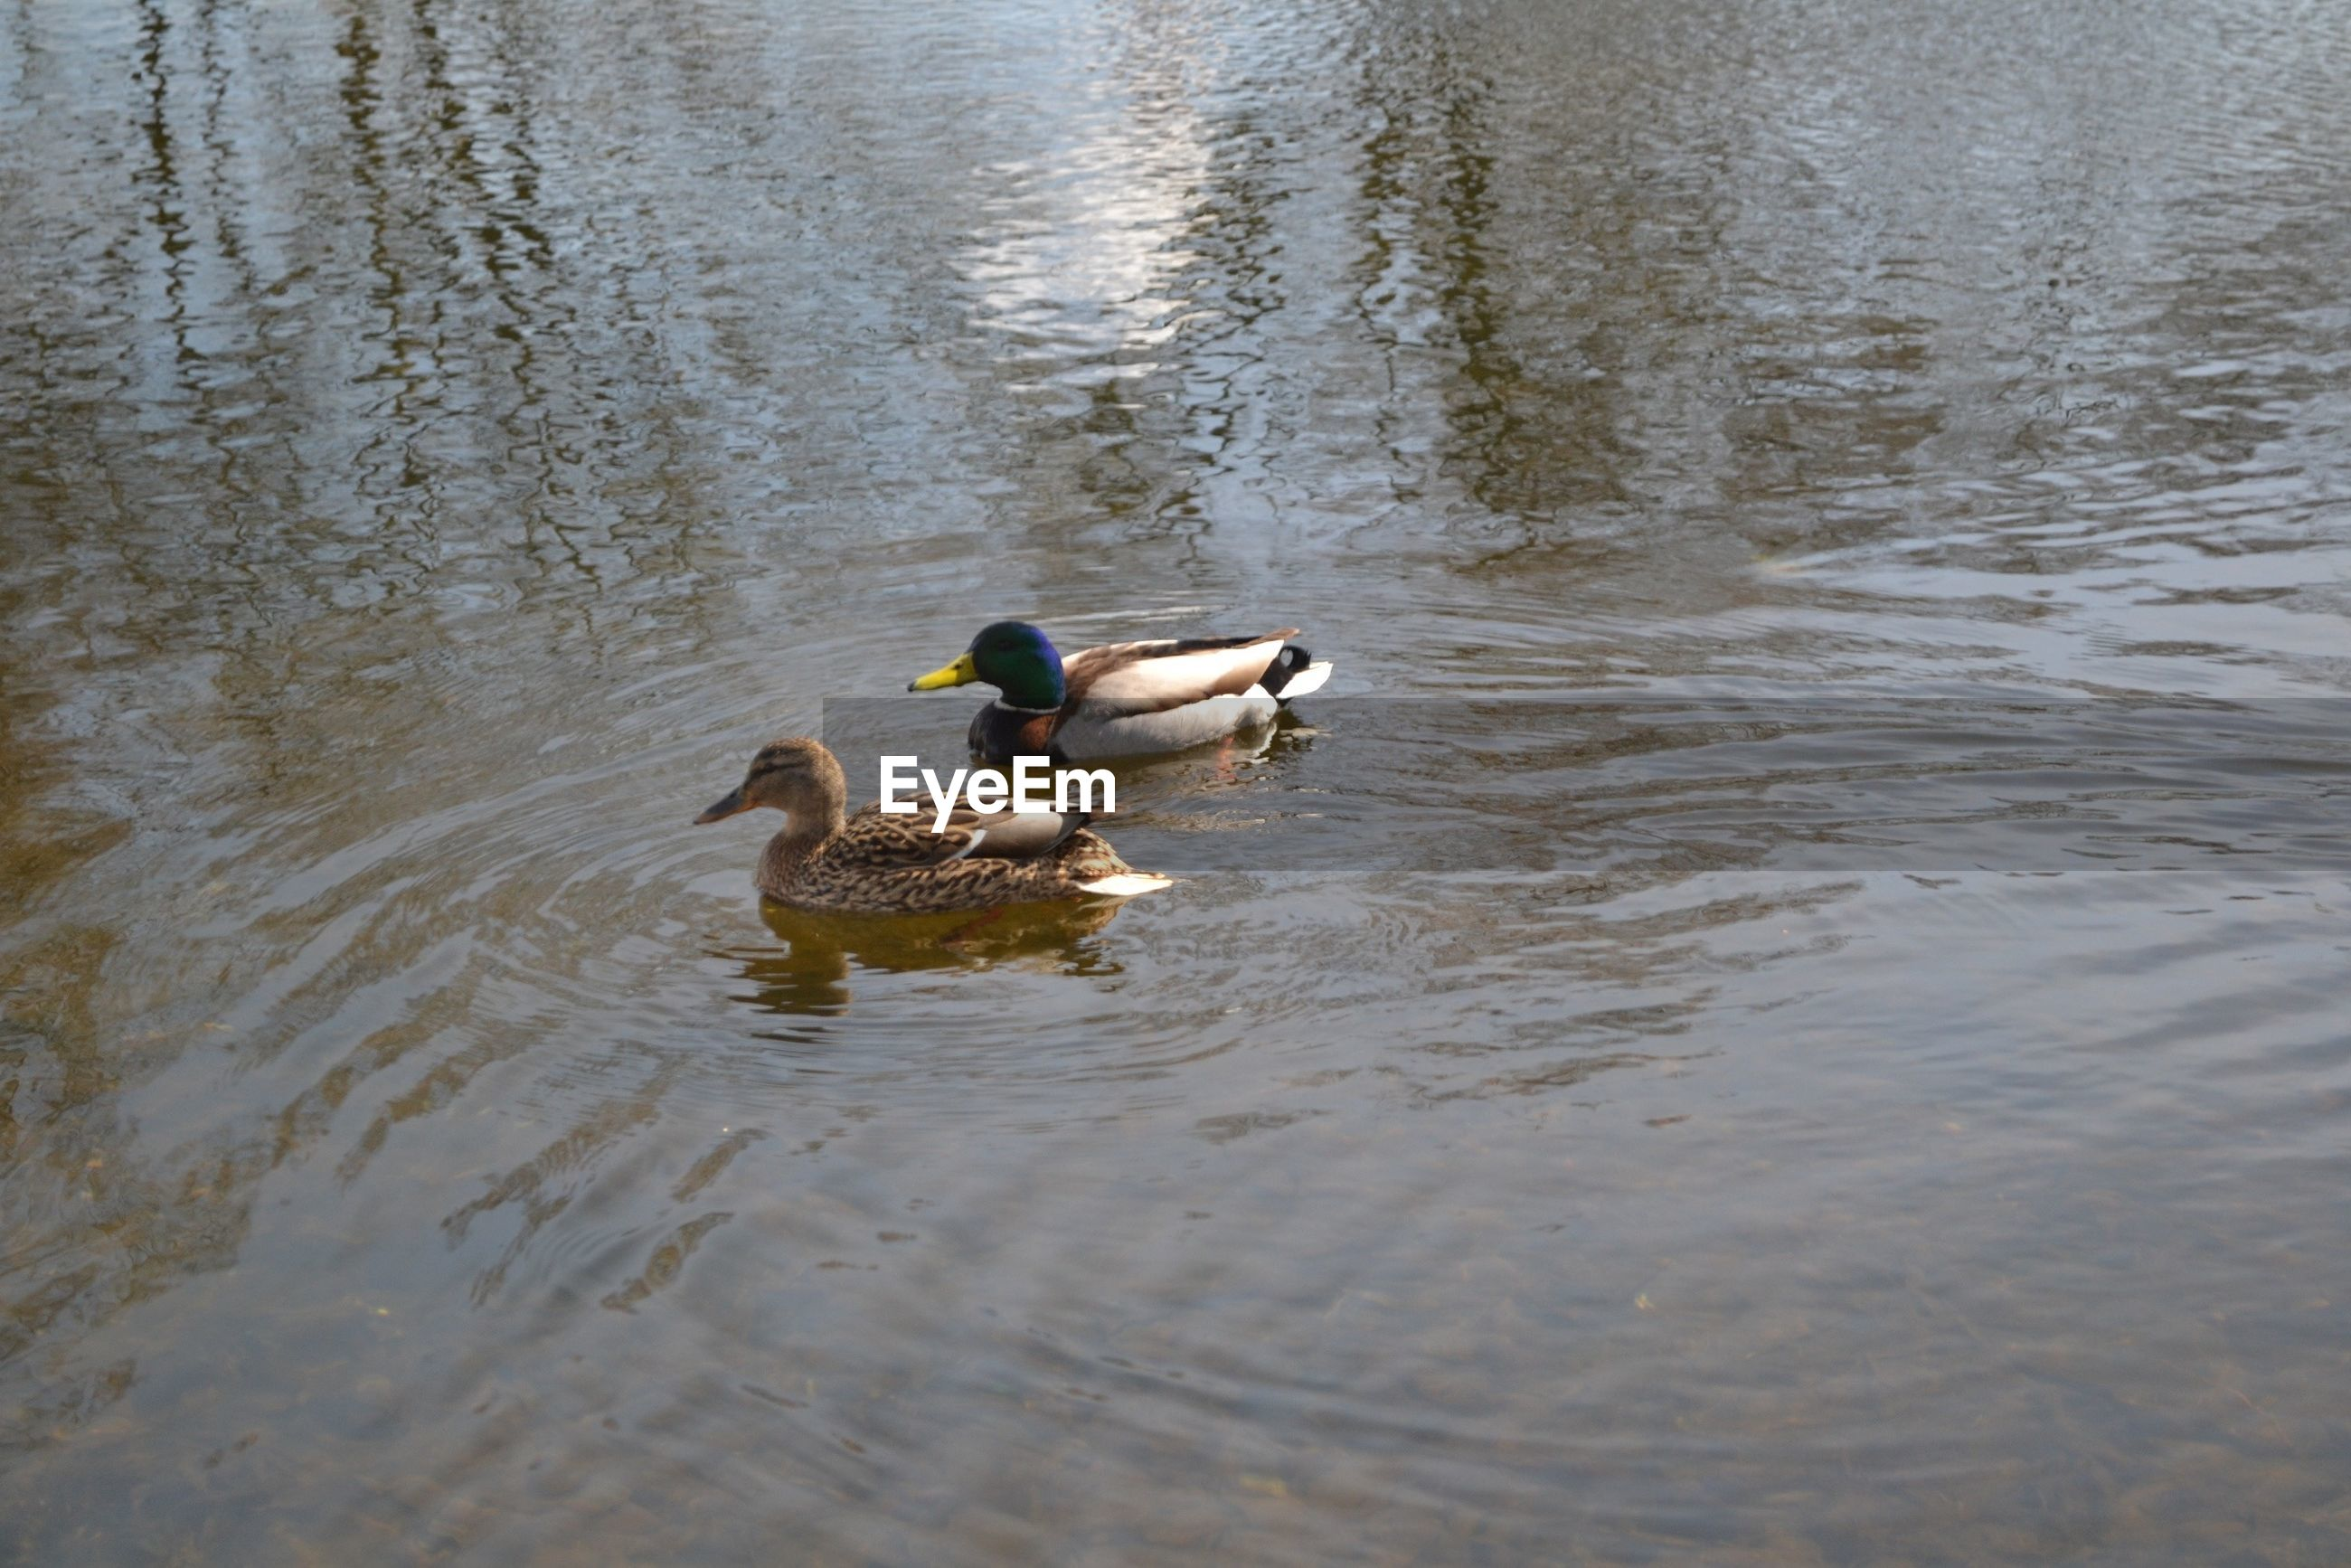 VIEW OF MALLARD DUCKS SWIMMING IN LAKE